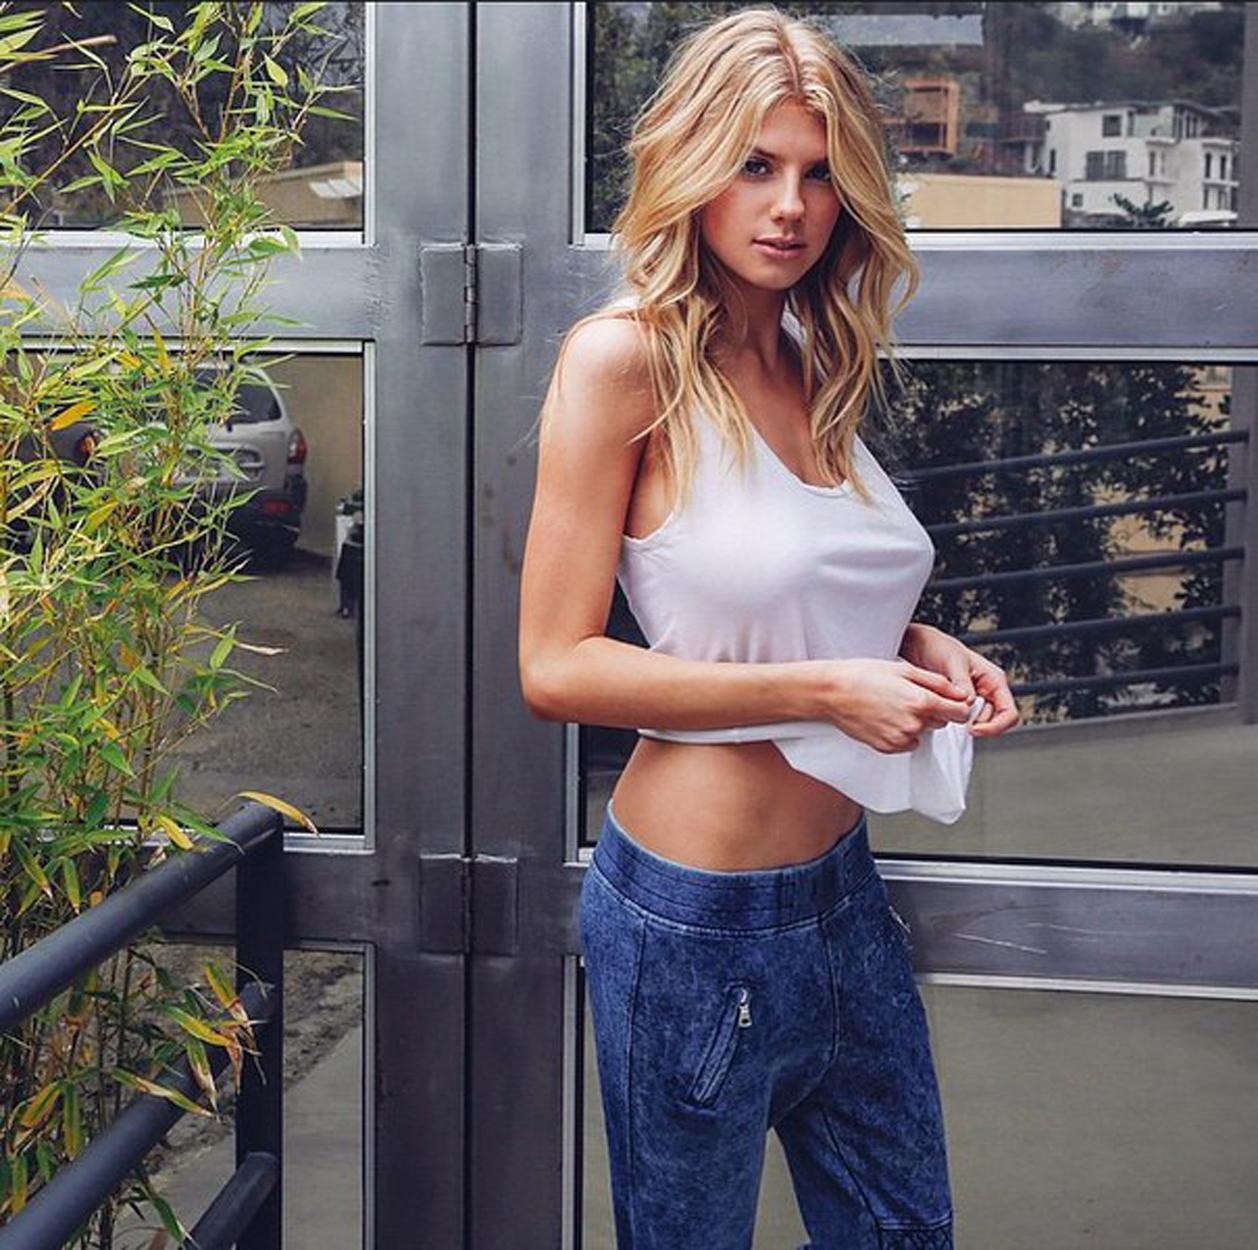 Charlotte Springers Pictures. Hotness Rating = 8.60/10